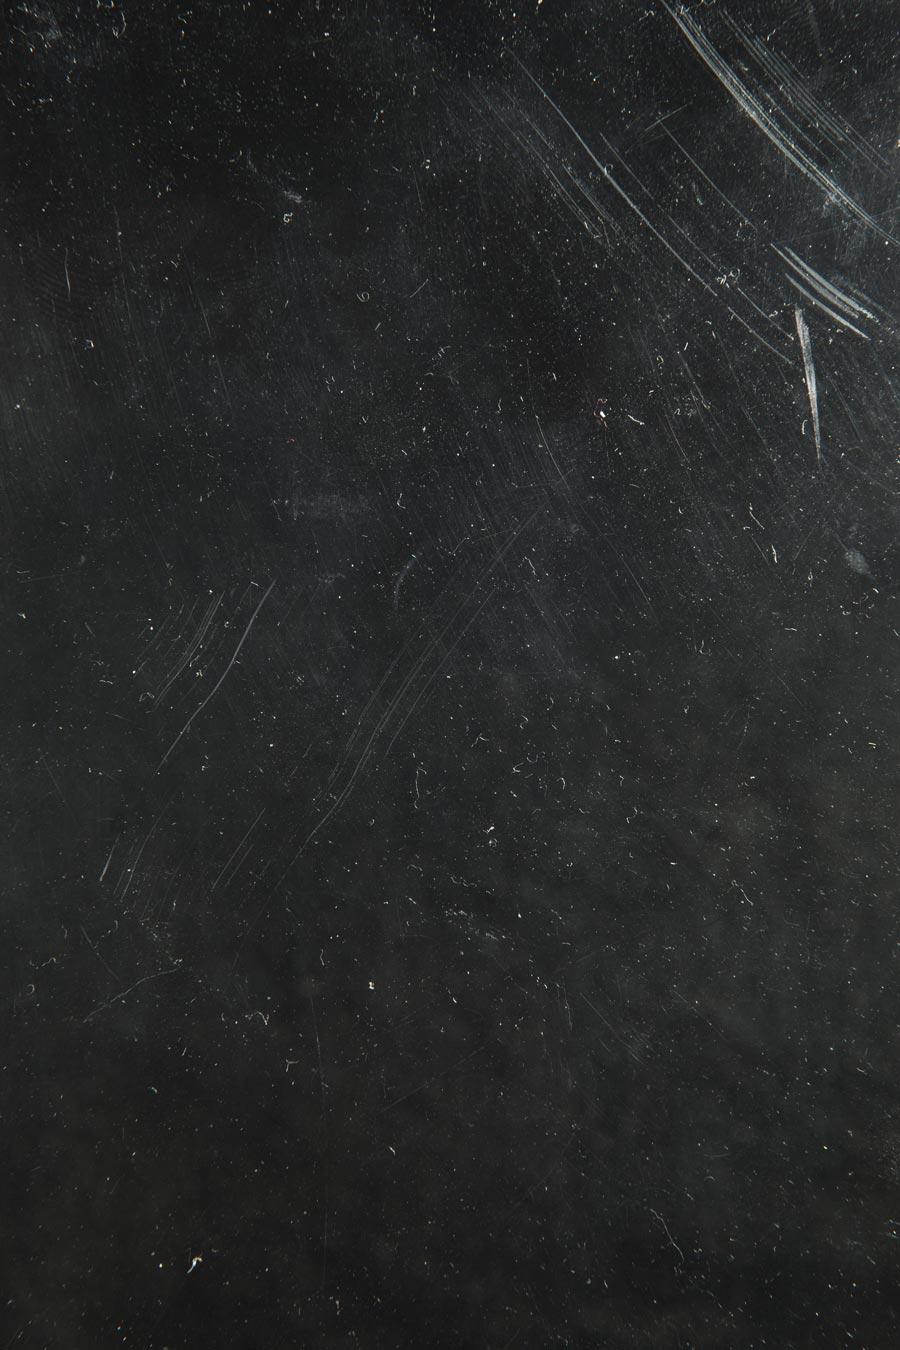 dust-scratch-overlay-photoshop